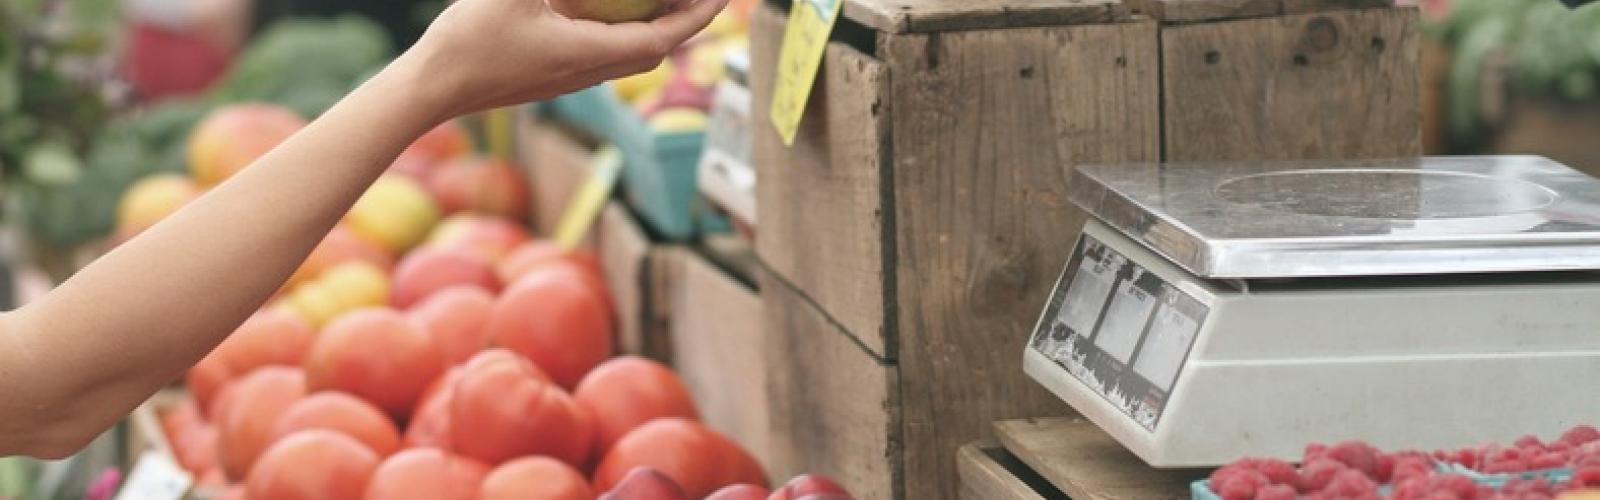 foto boerenmarkt